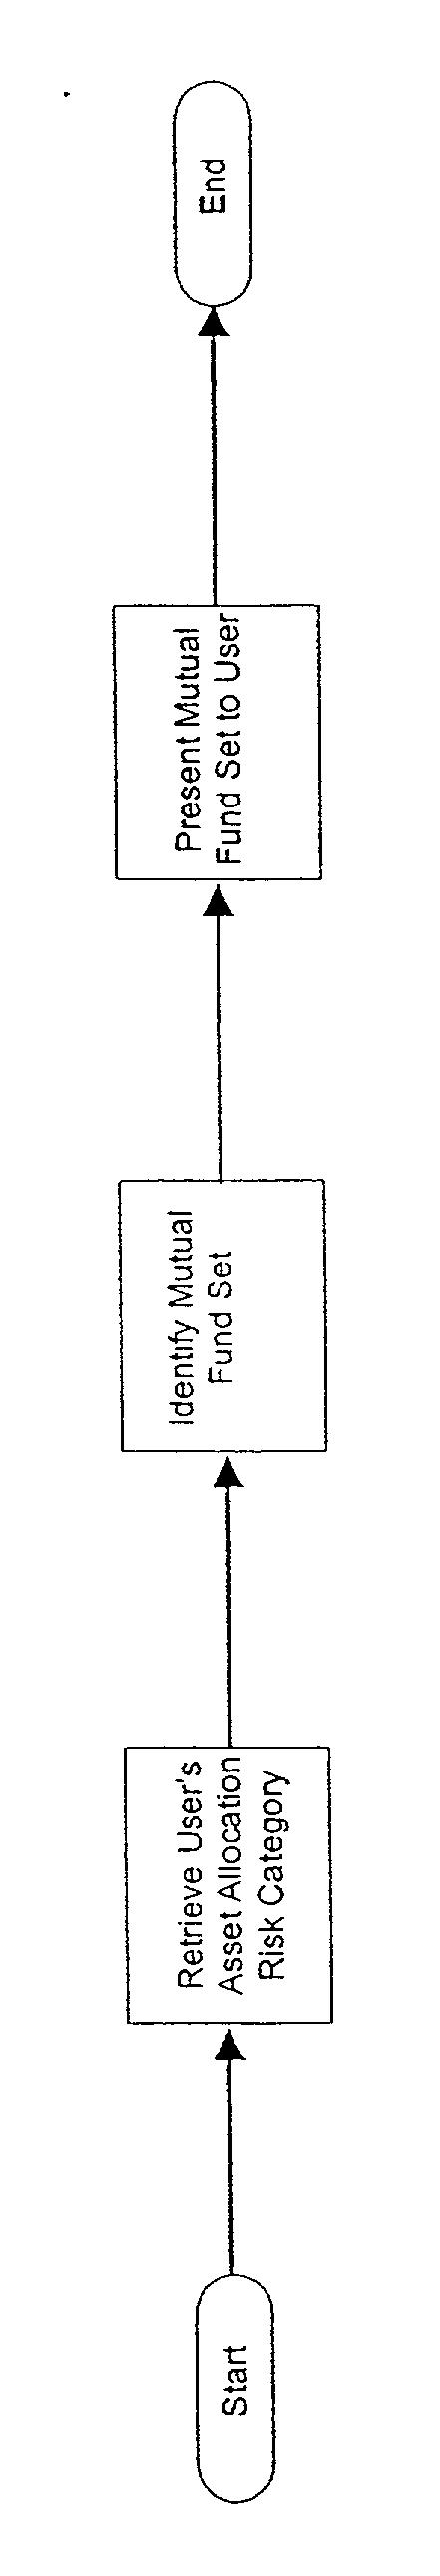 Figure US20020152151A1-20021017-P00009